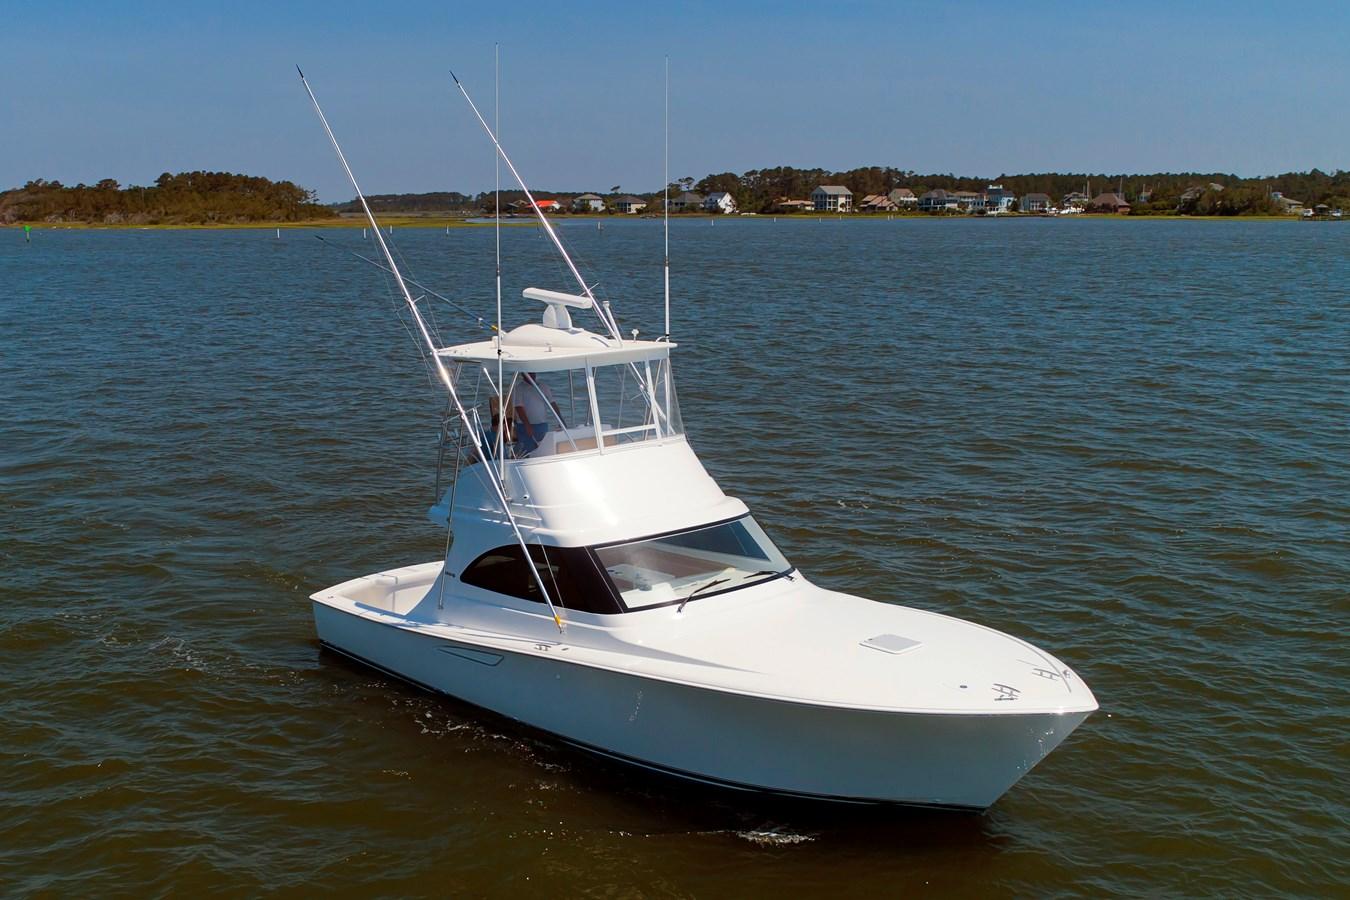 Viking 38 Billfish Starboard Bow - 38 VIKING For Sale